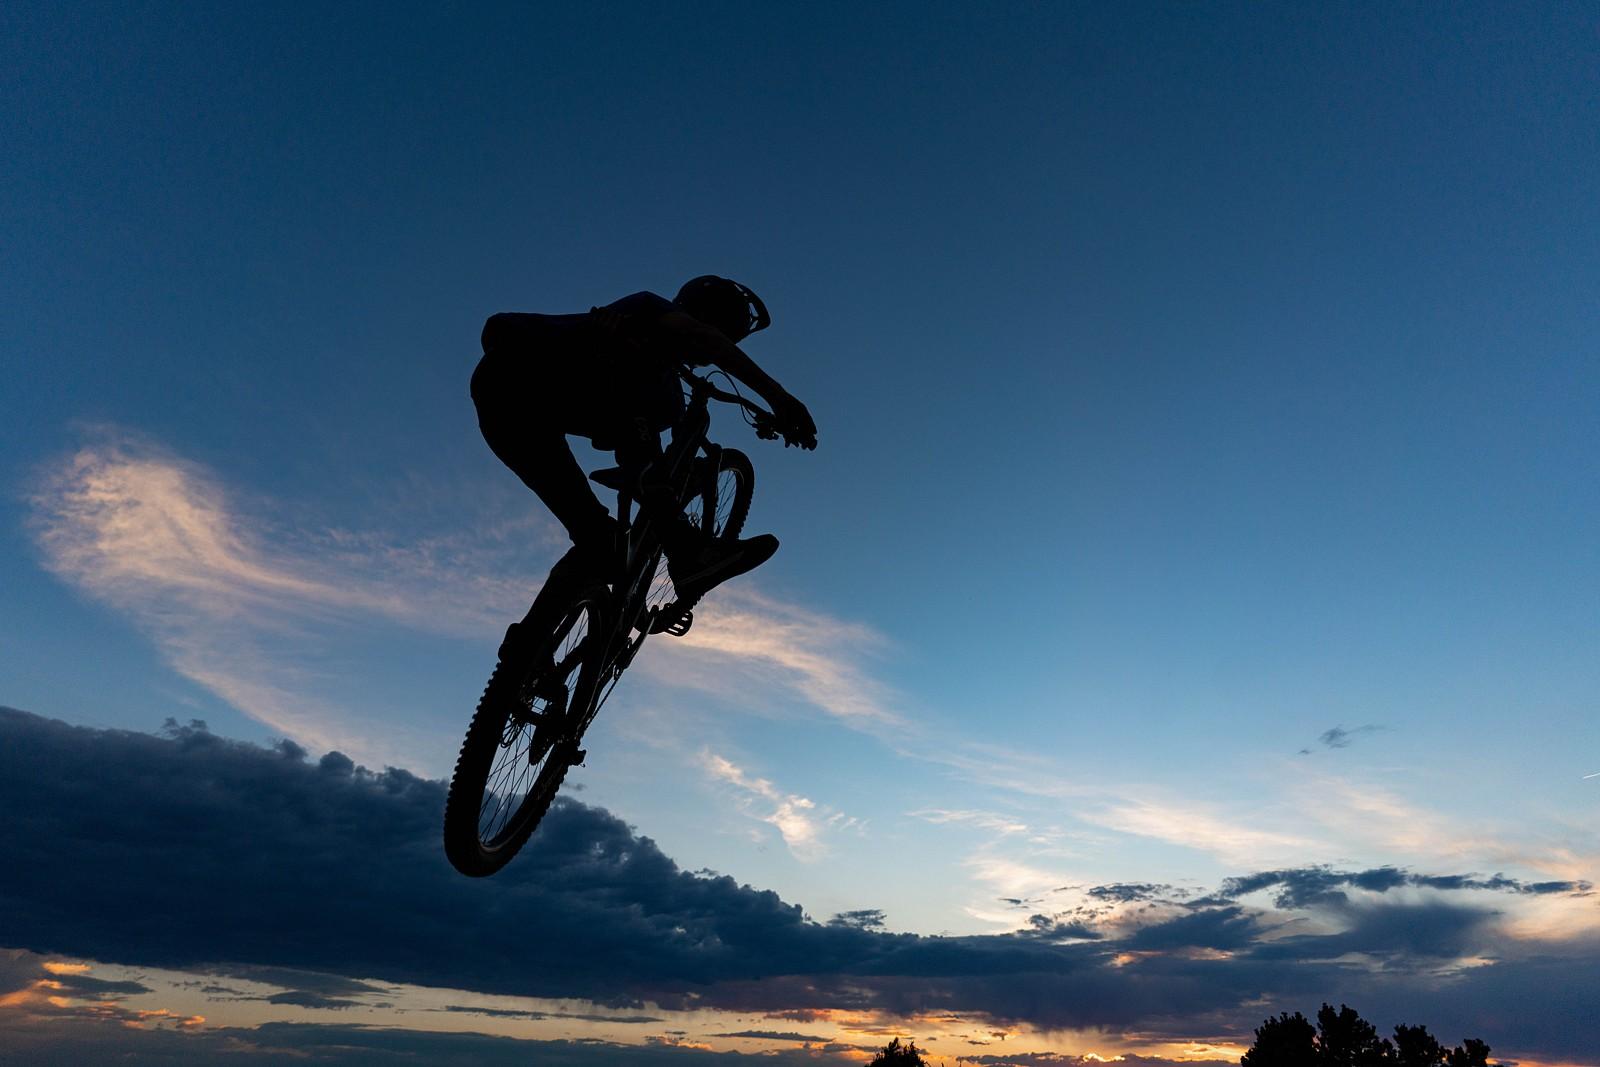 Climbing a bike in the sky  - legpwr - Mountain Biking Pictures - Vital MTB